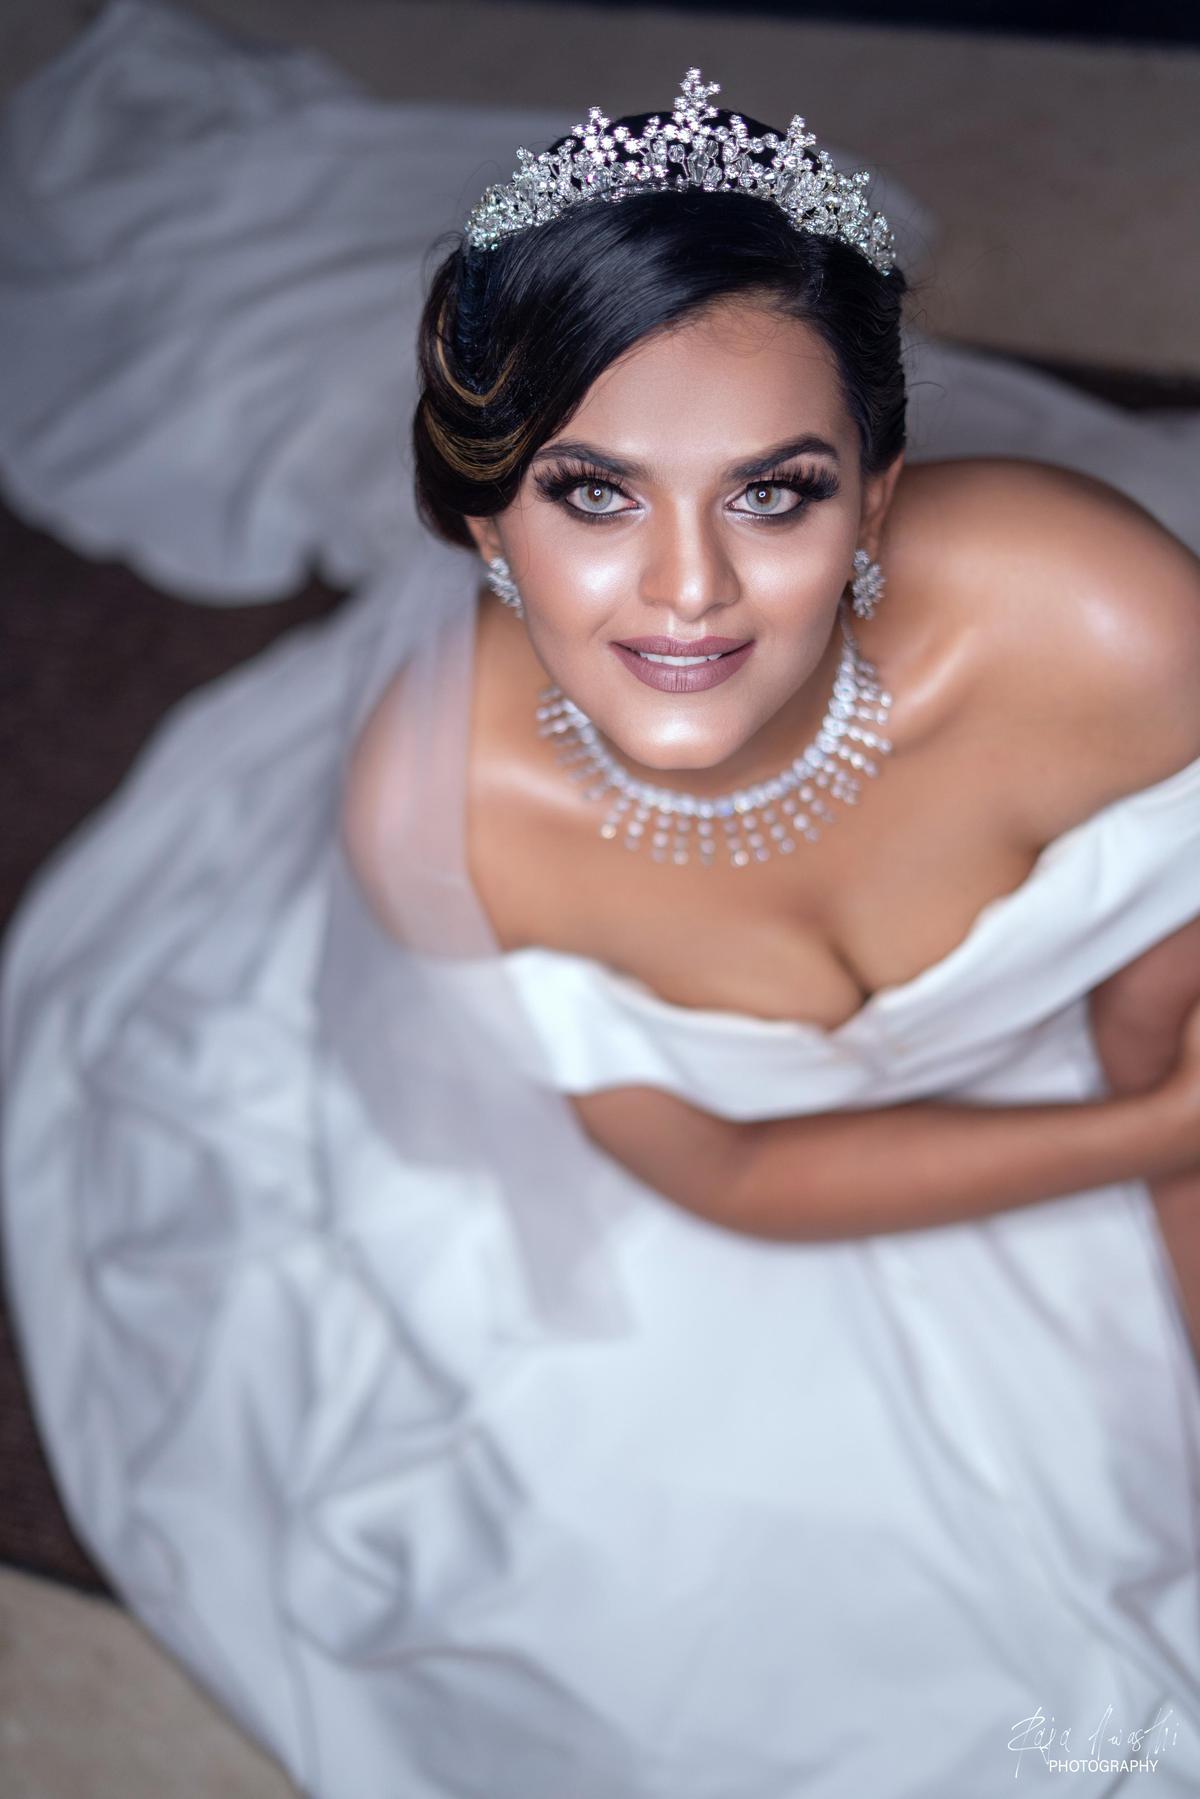 Image of Hair, Headpiece, Bride, Photograph, Hair accessory, Bridal accessory etc.